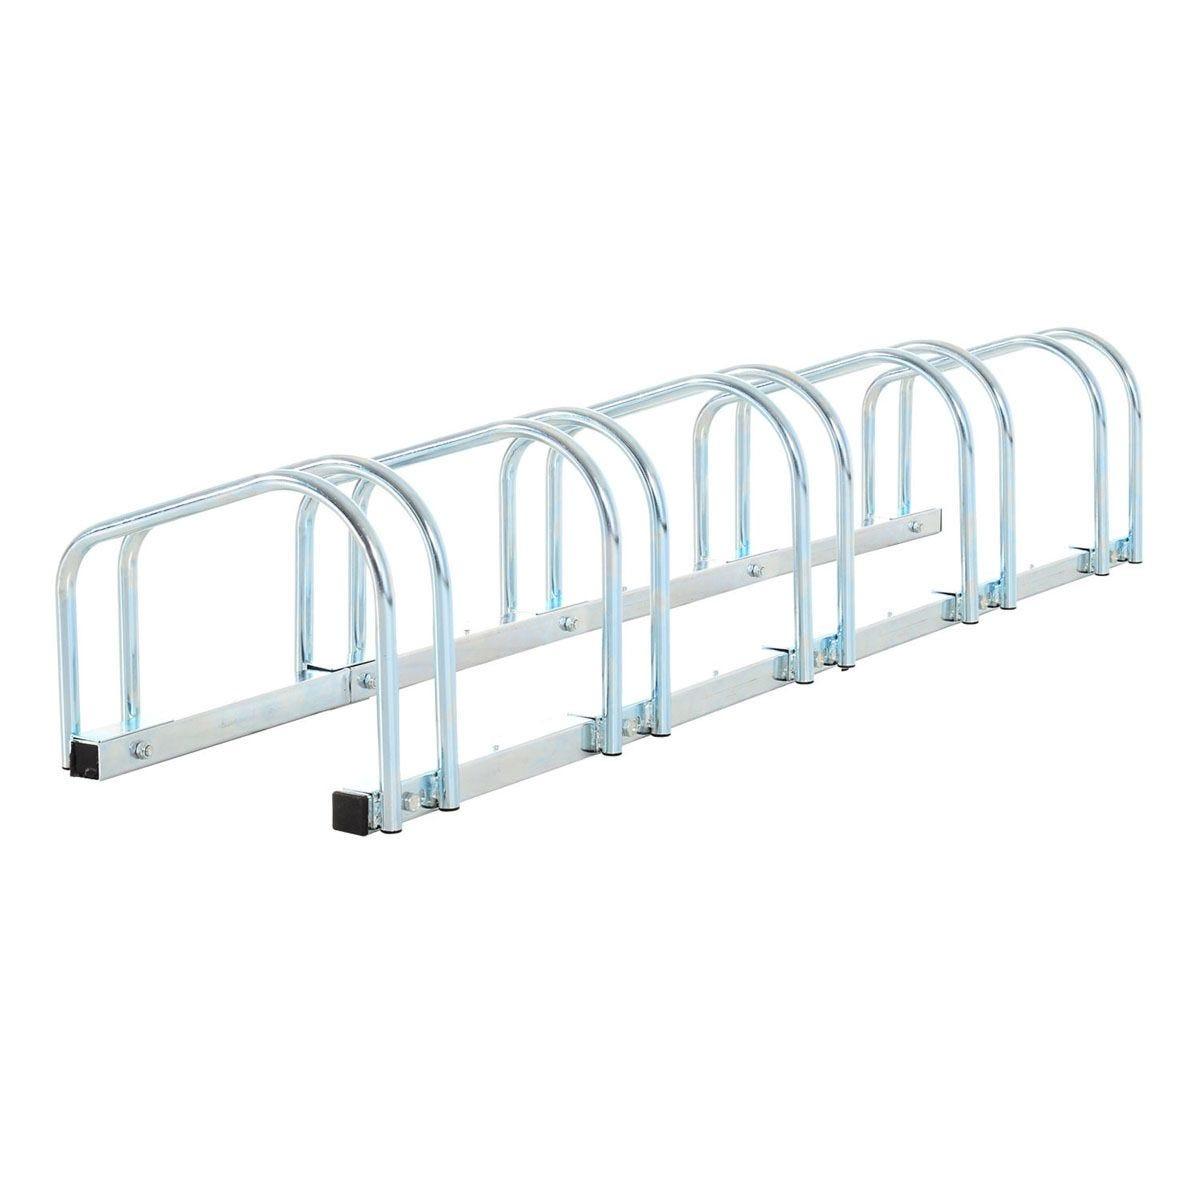 HOMCOM 5 Bike Parking Rack Locking Storage Stand Holder Outdoor Floor Wall Mount Steel - Silver